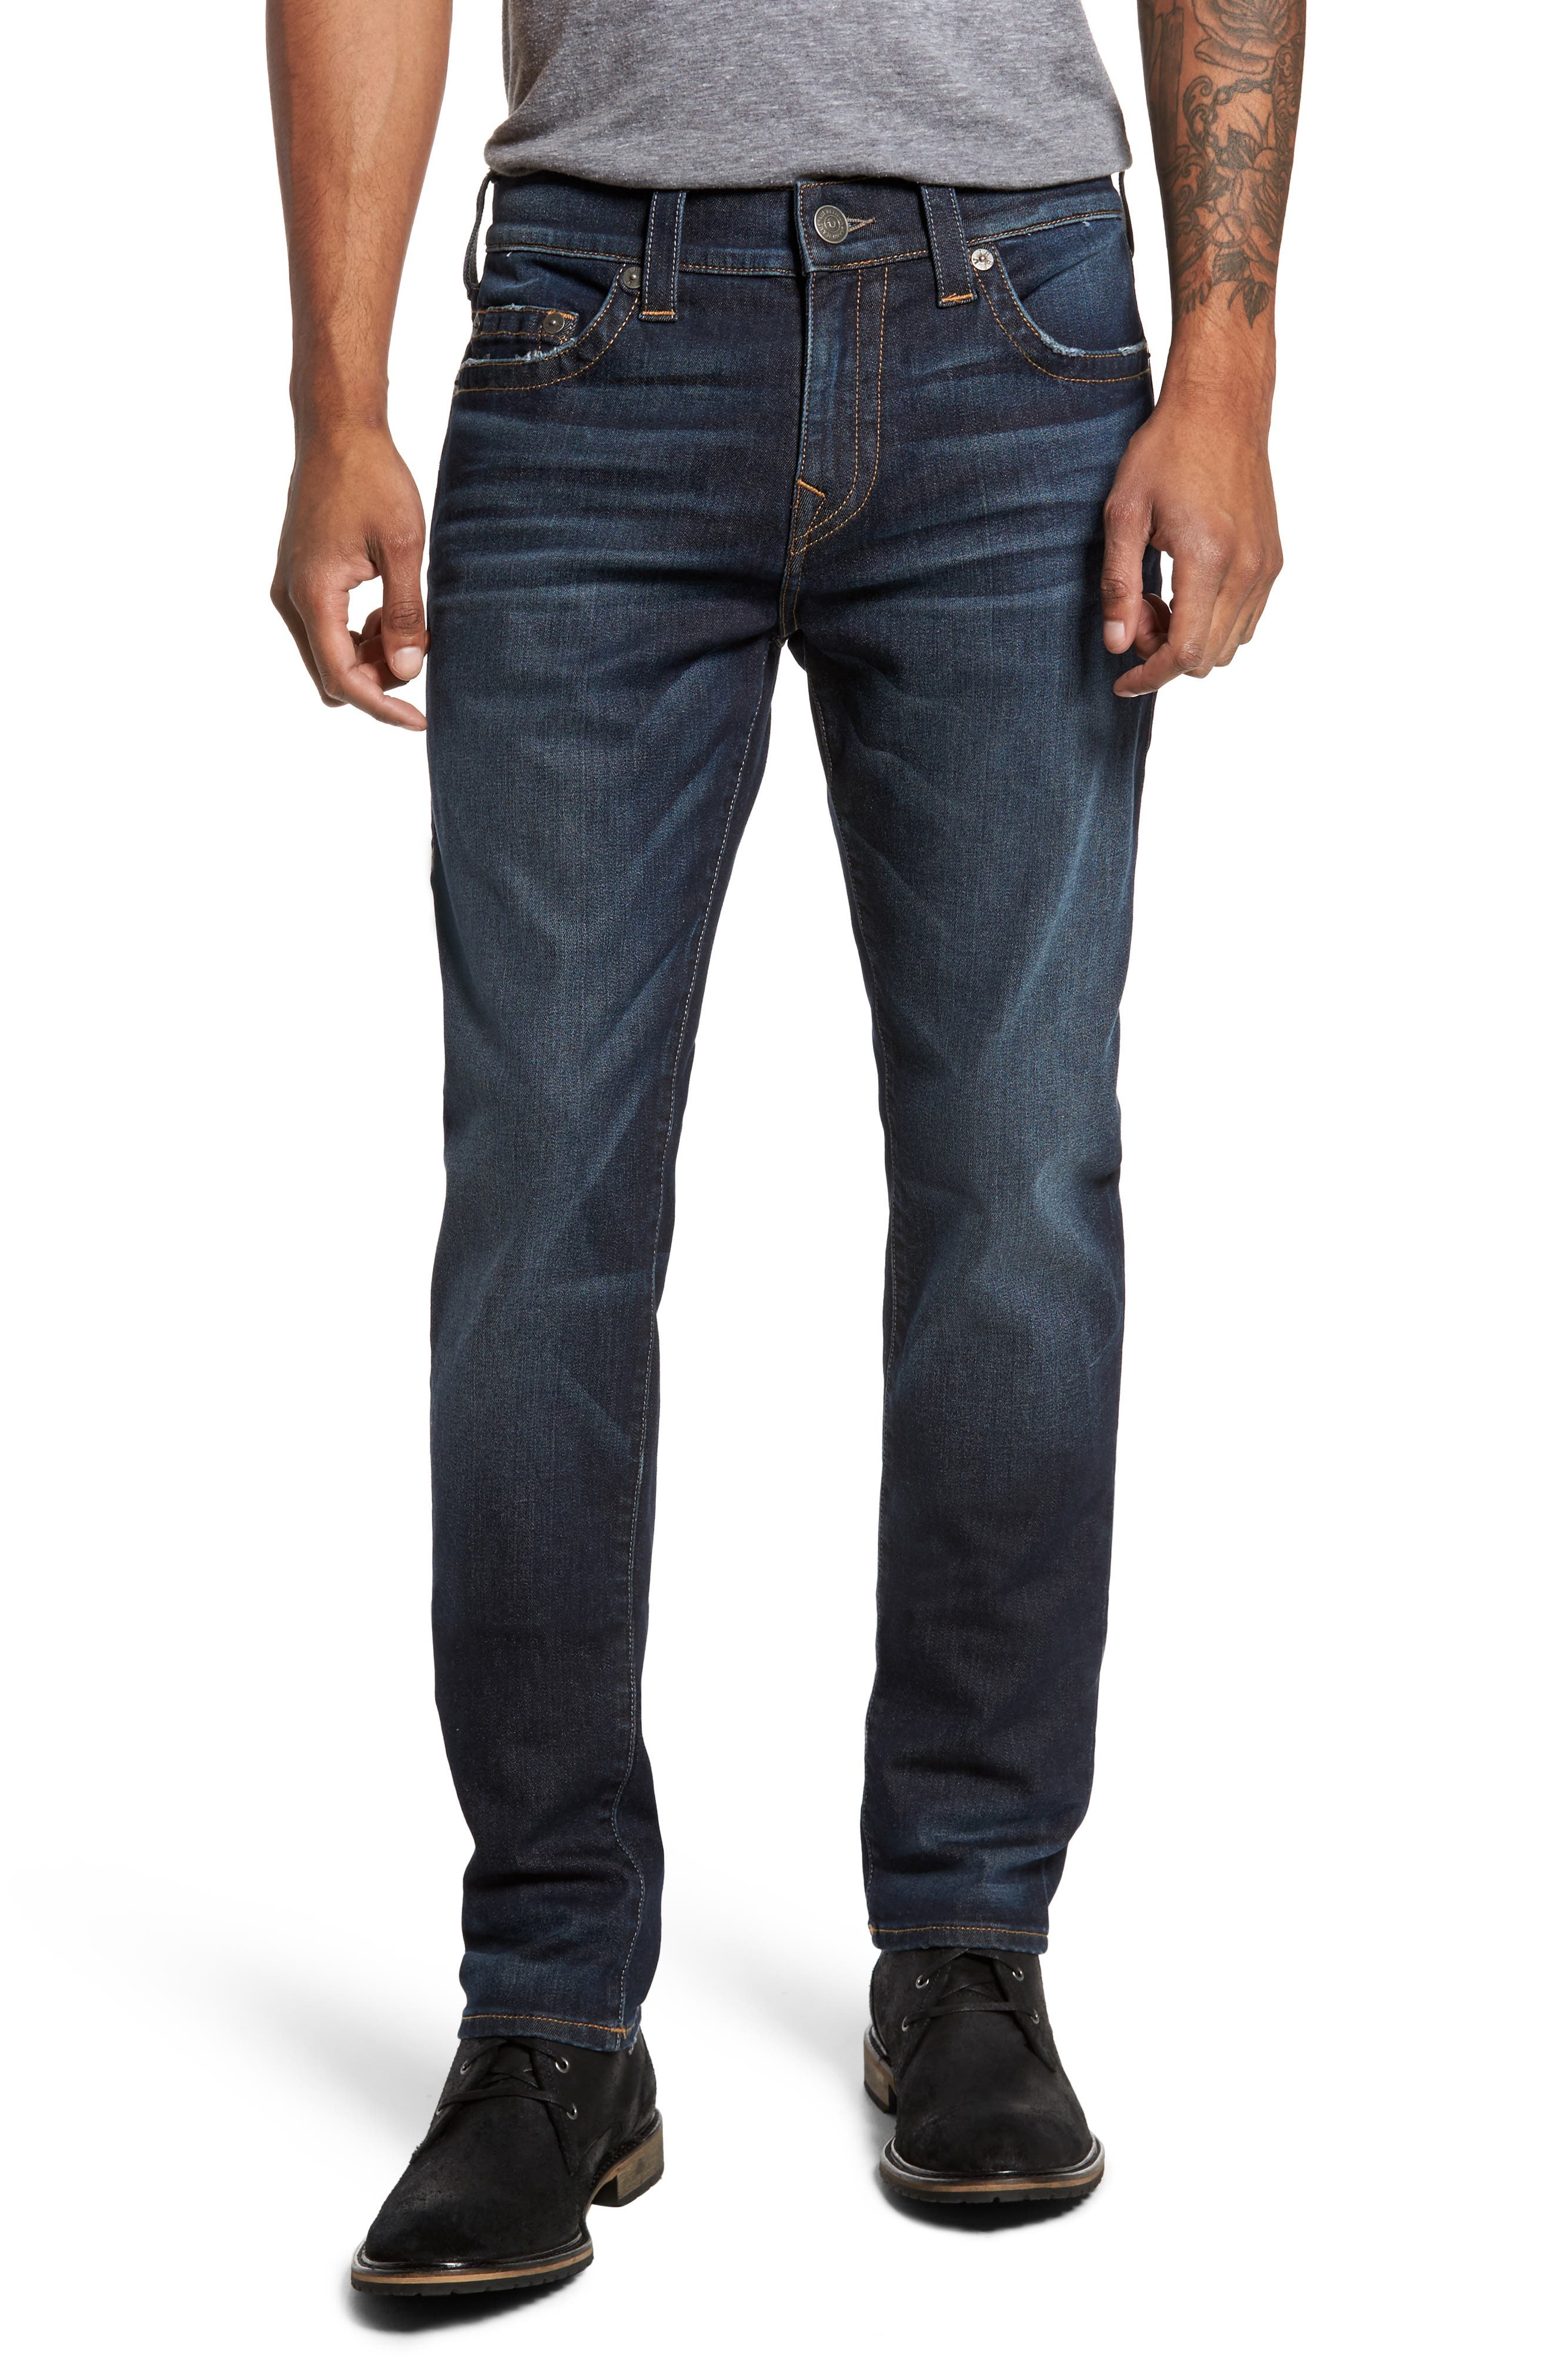 Main Image - True Religion Brand Jeans Rocco Skinny Fit Jeans (Dark Indigo Luxe)